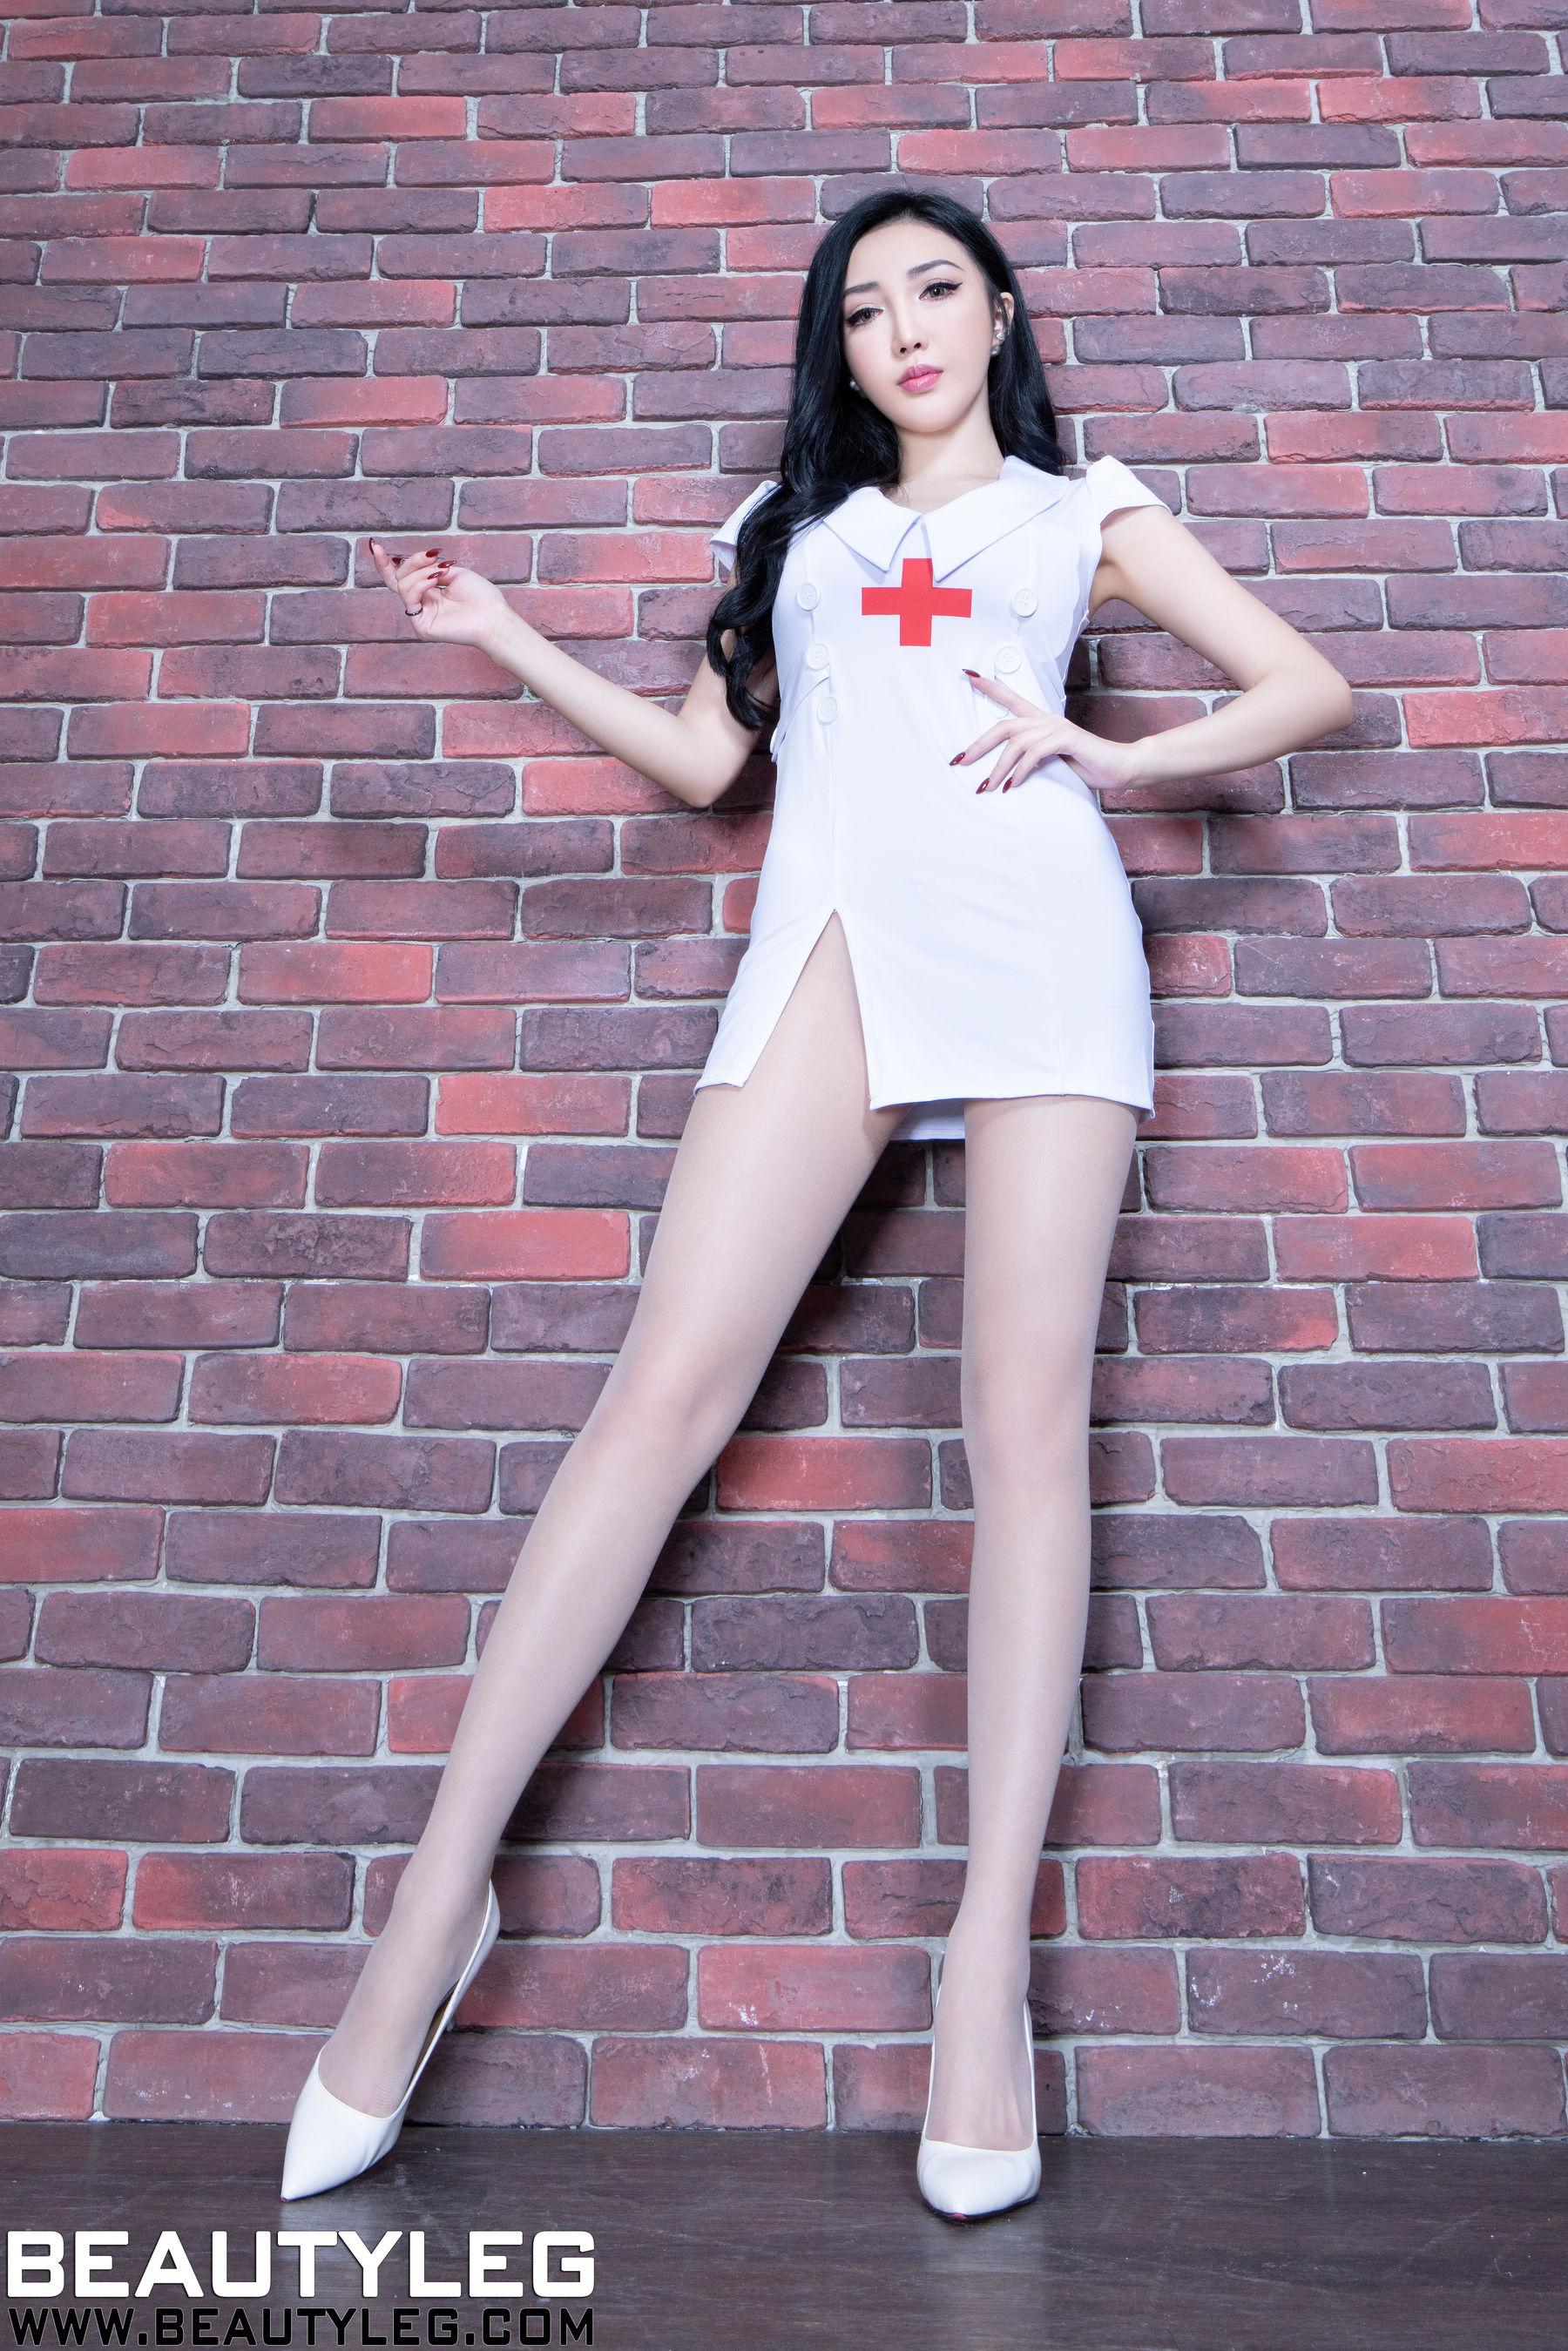 VOL.1114 [Beautyleg]肉丝美腿:赵芸(腿模Syuan,Syuan赵芸)超高清个人性感漂亮大图(65P)